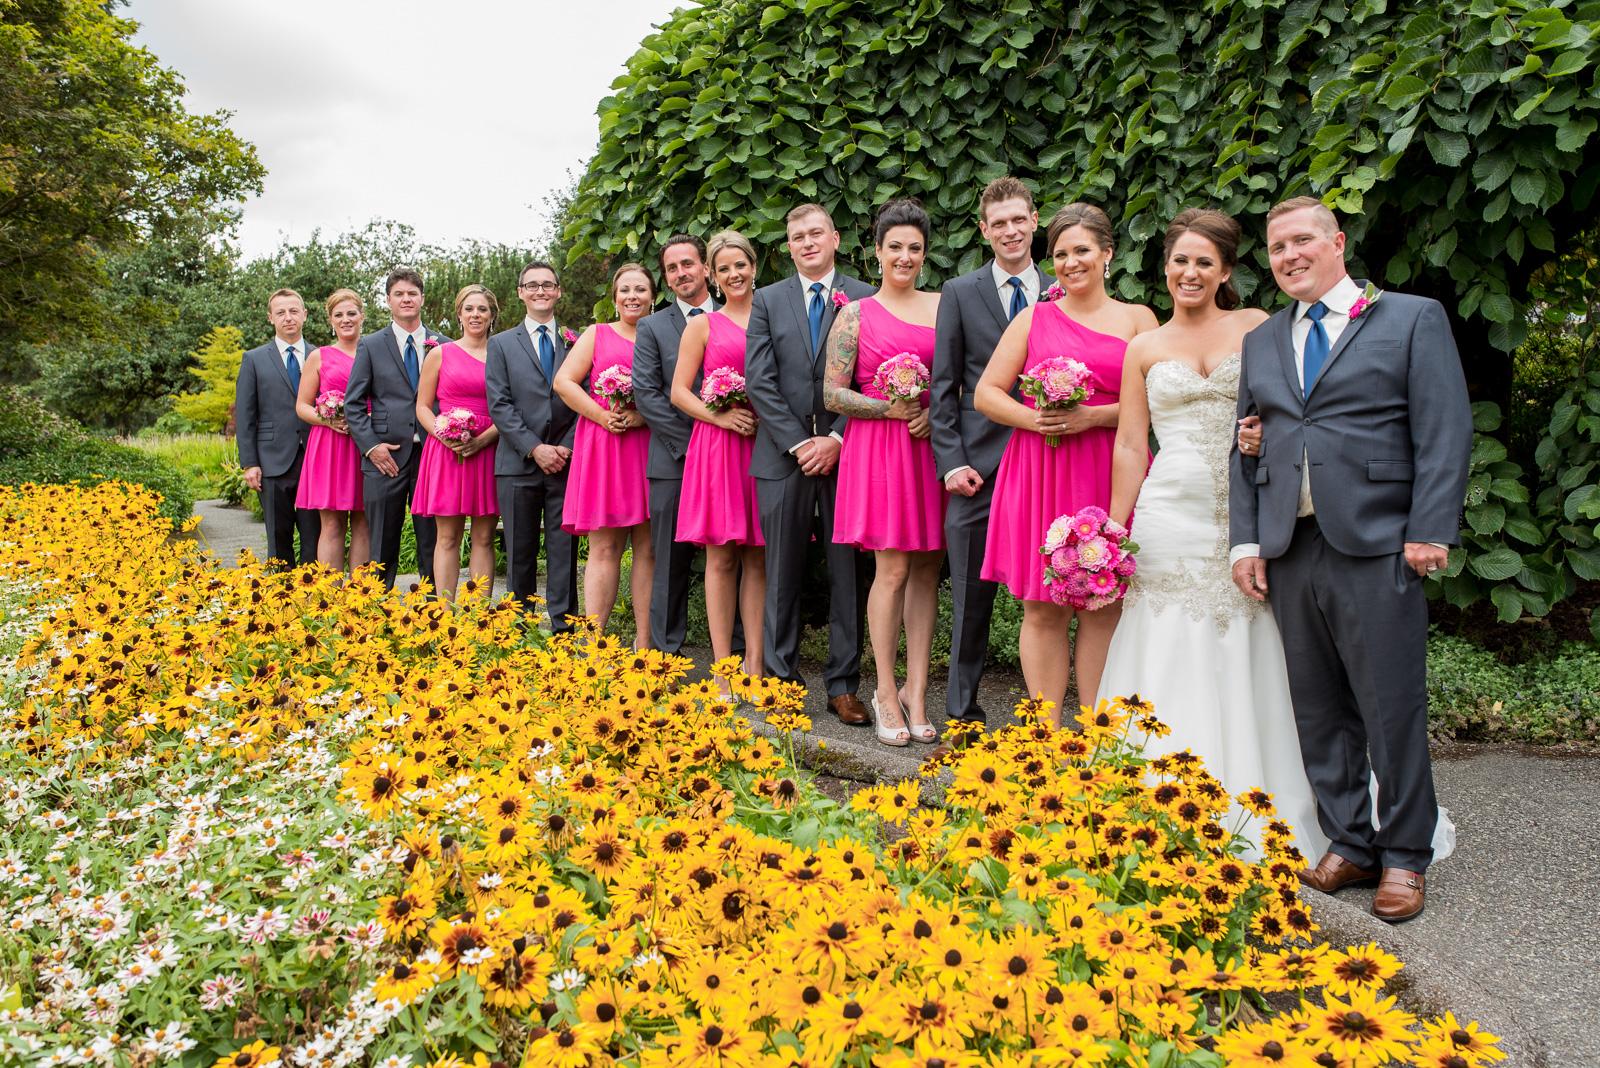 victoria-wedding-photographers-burnaby-mountain-wedding-burnaby-rowing-club-wedding-17.jpg